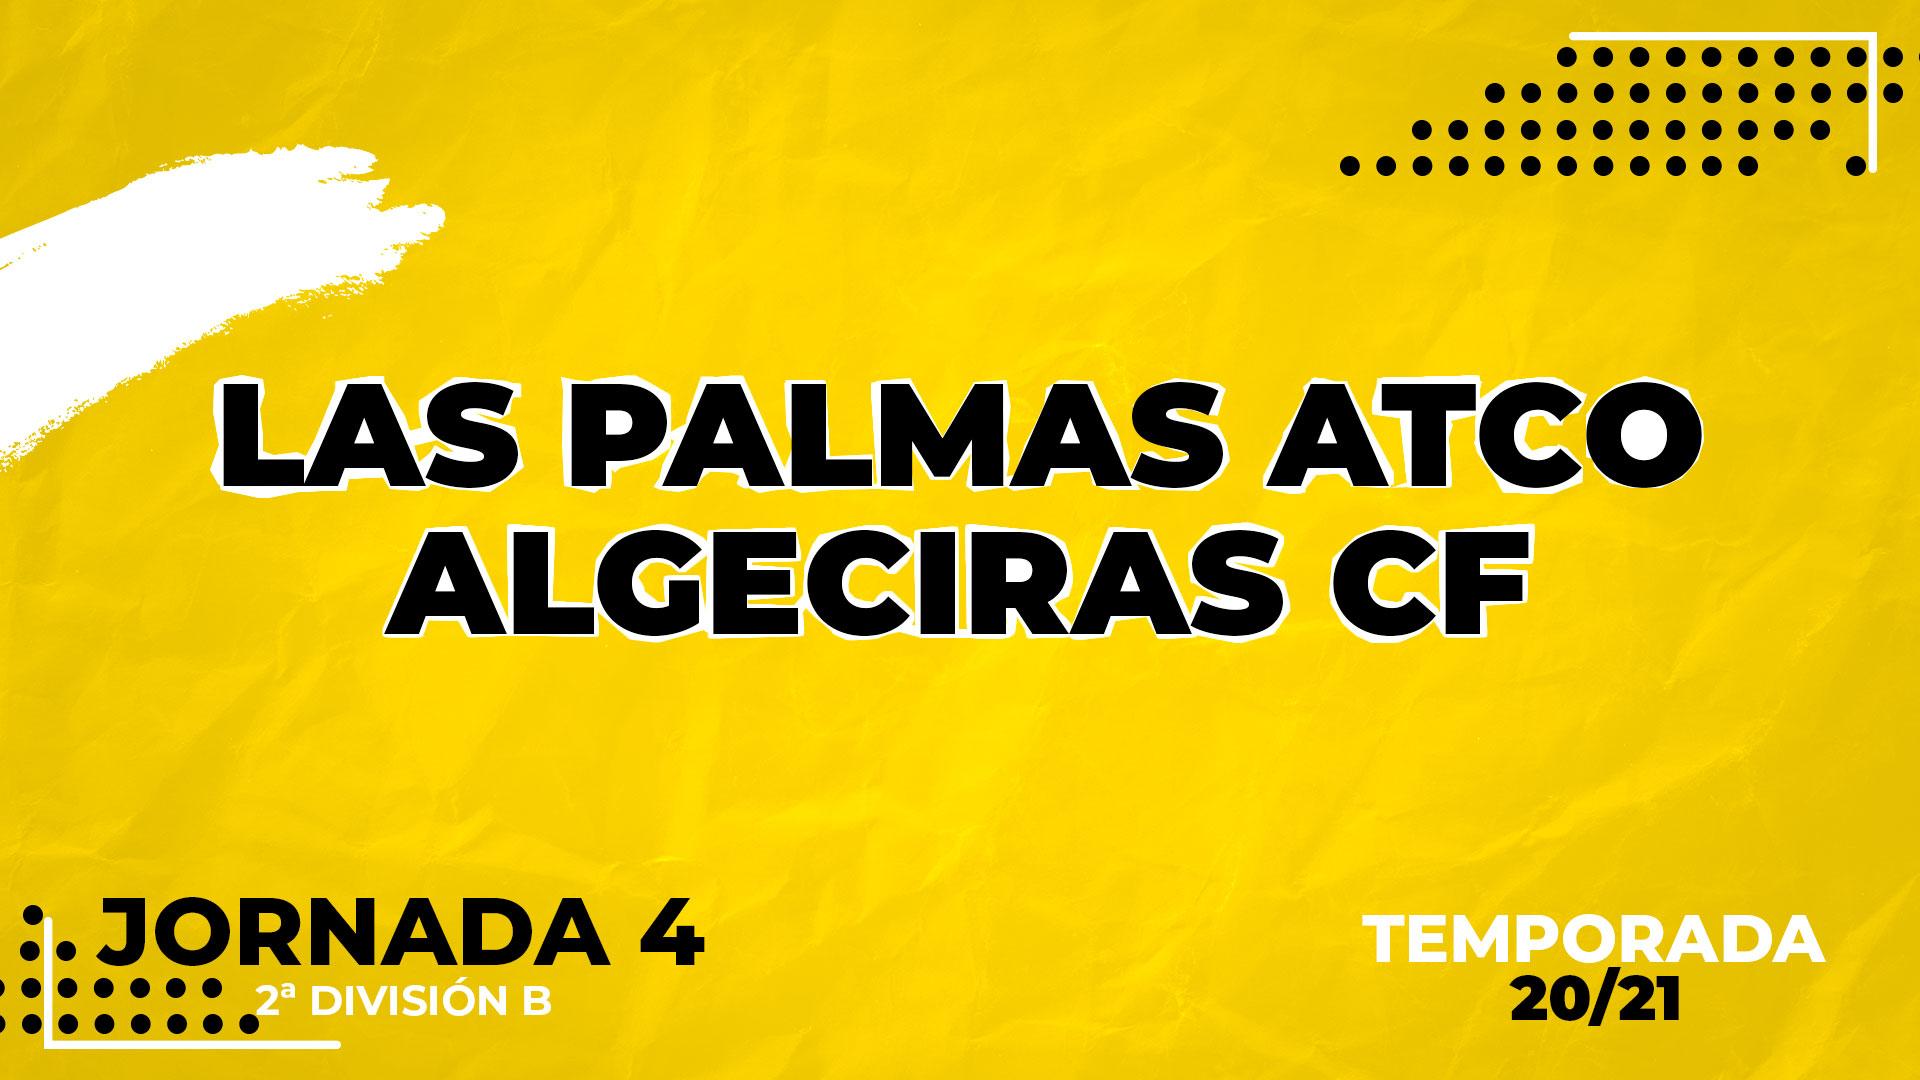 Las Palmas Atlético vs Algeciras